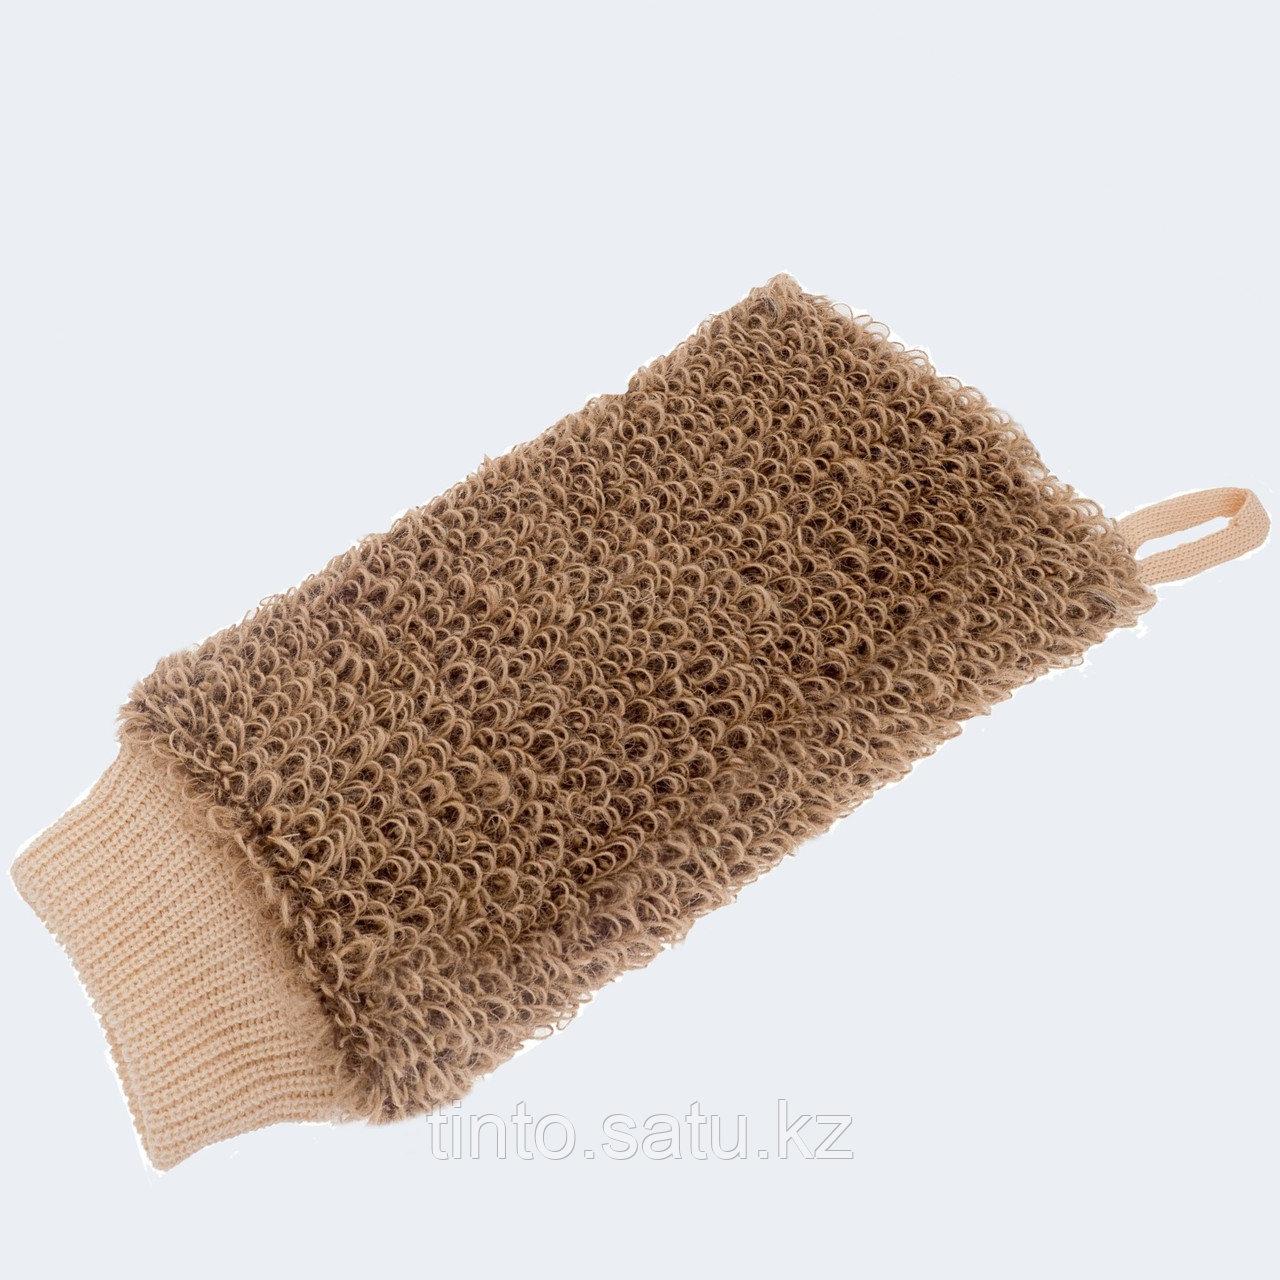 Мочалка-руковица из Джута Мойдодыр